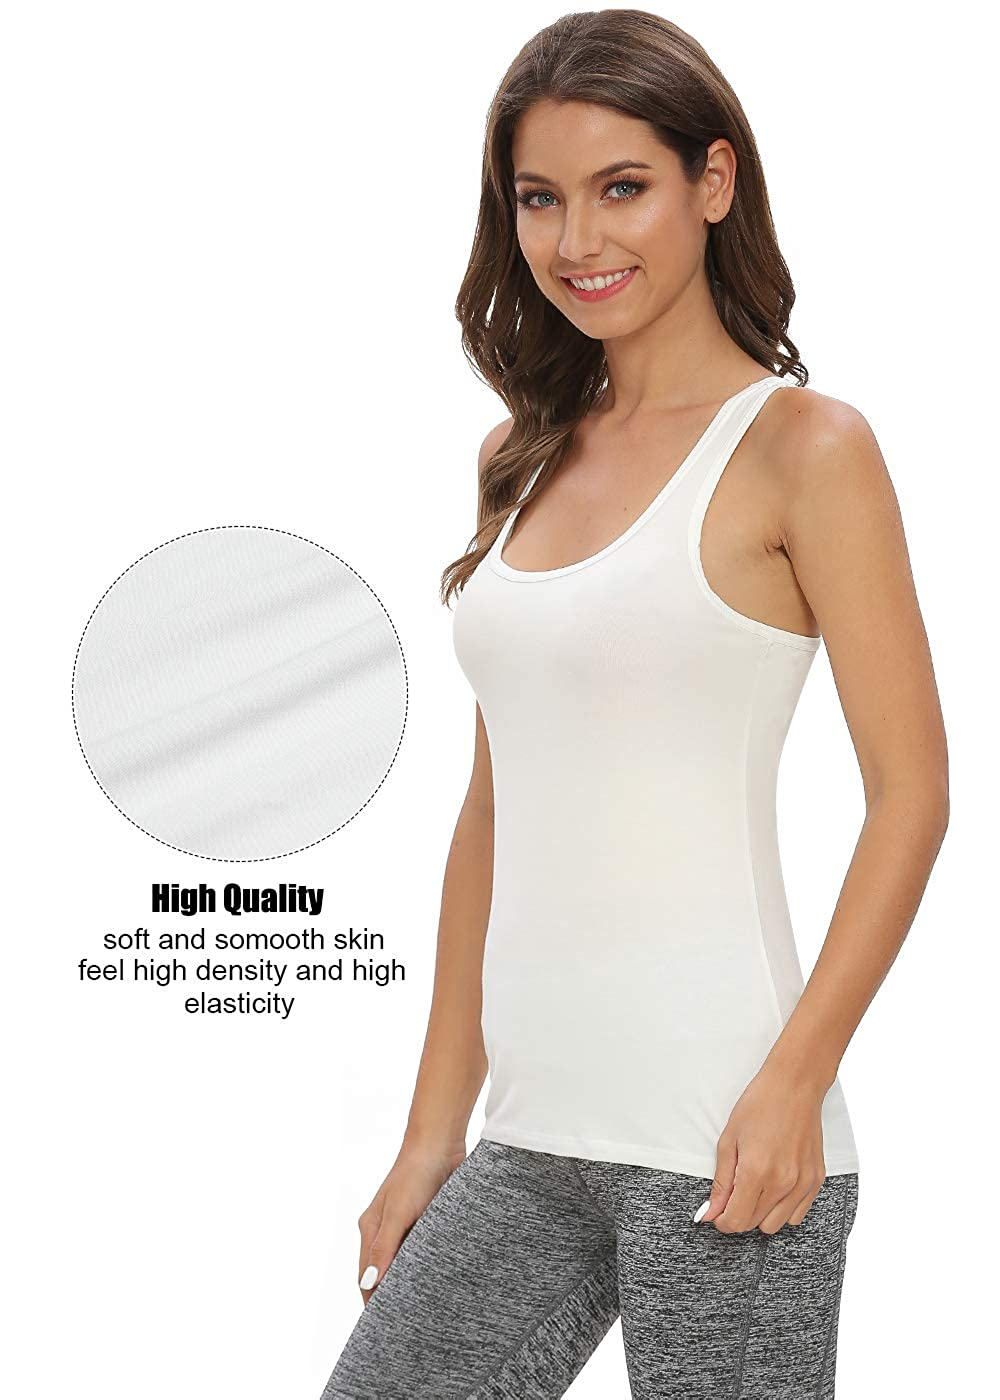 Star Vibe Racerback Tank Tops for Women 4 Pack Workout Tanks Undershirts Yoga Shirts Sleeveless Basic Tank Tops